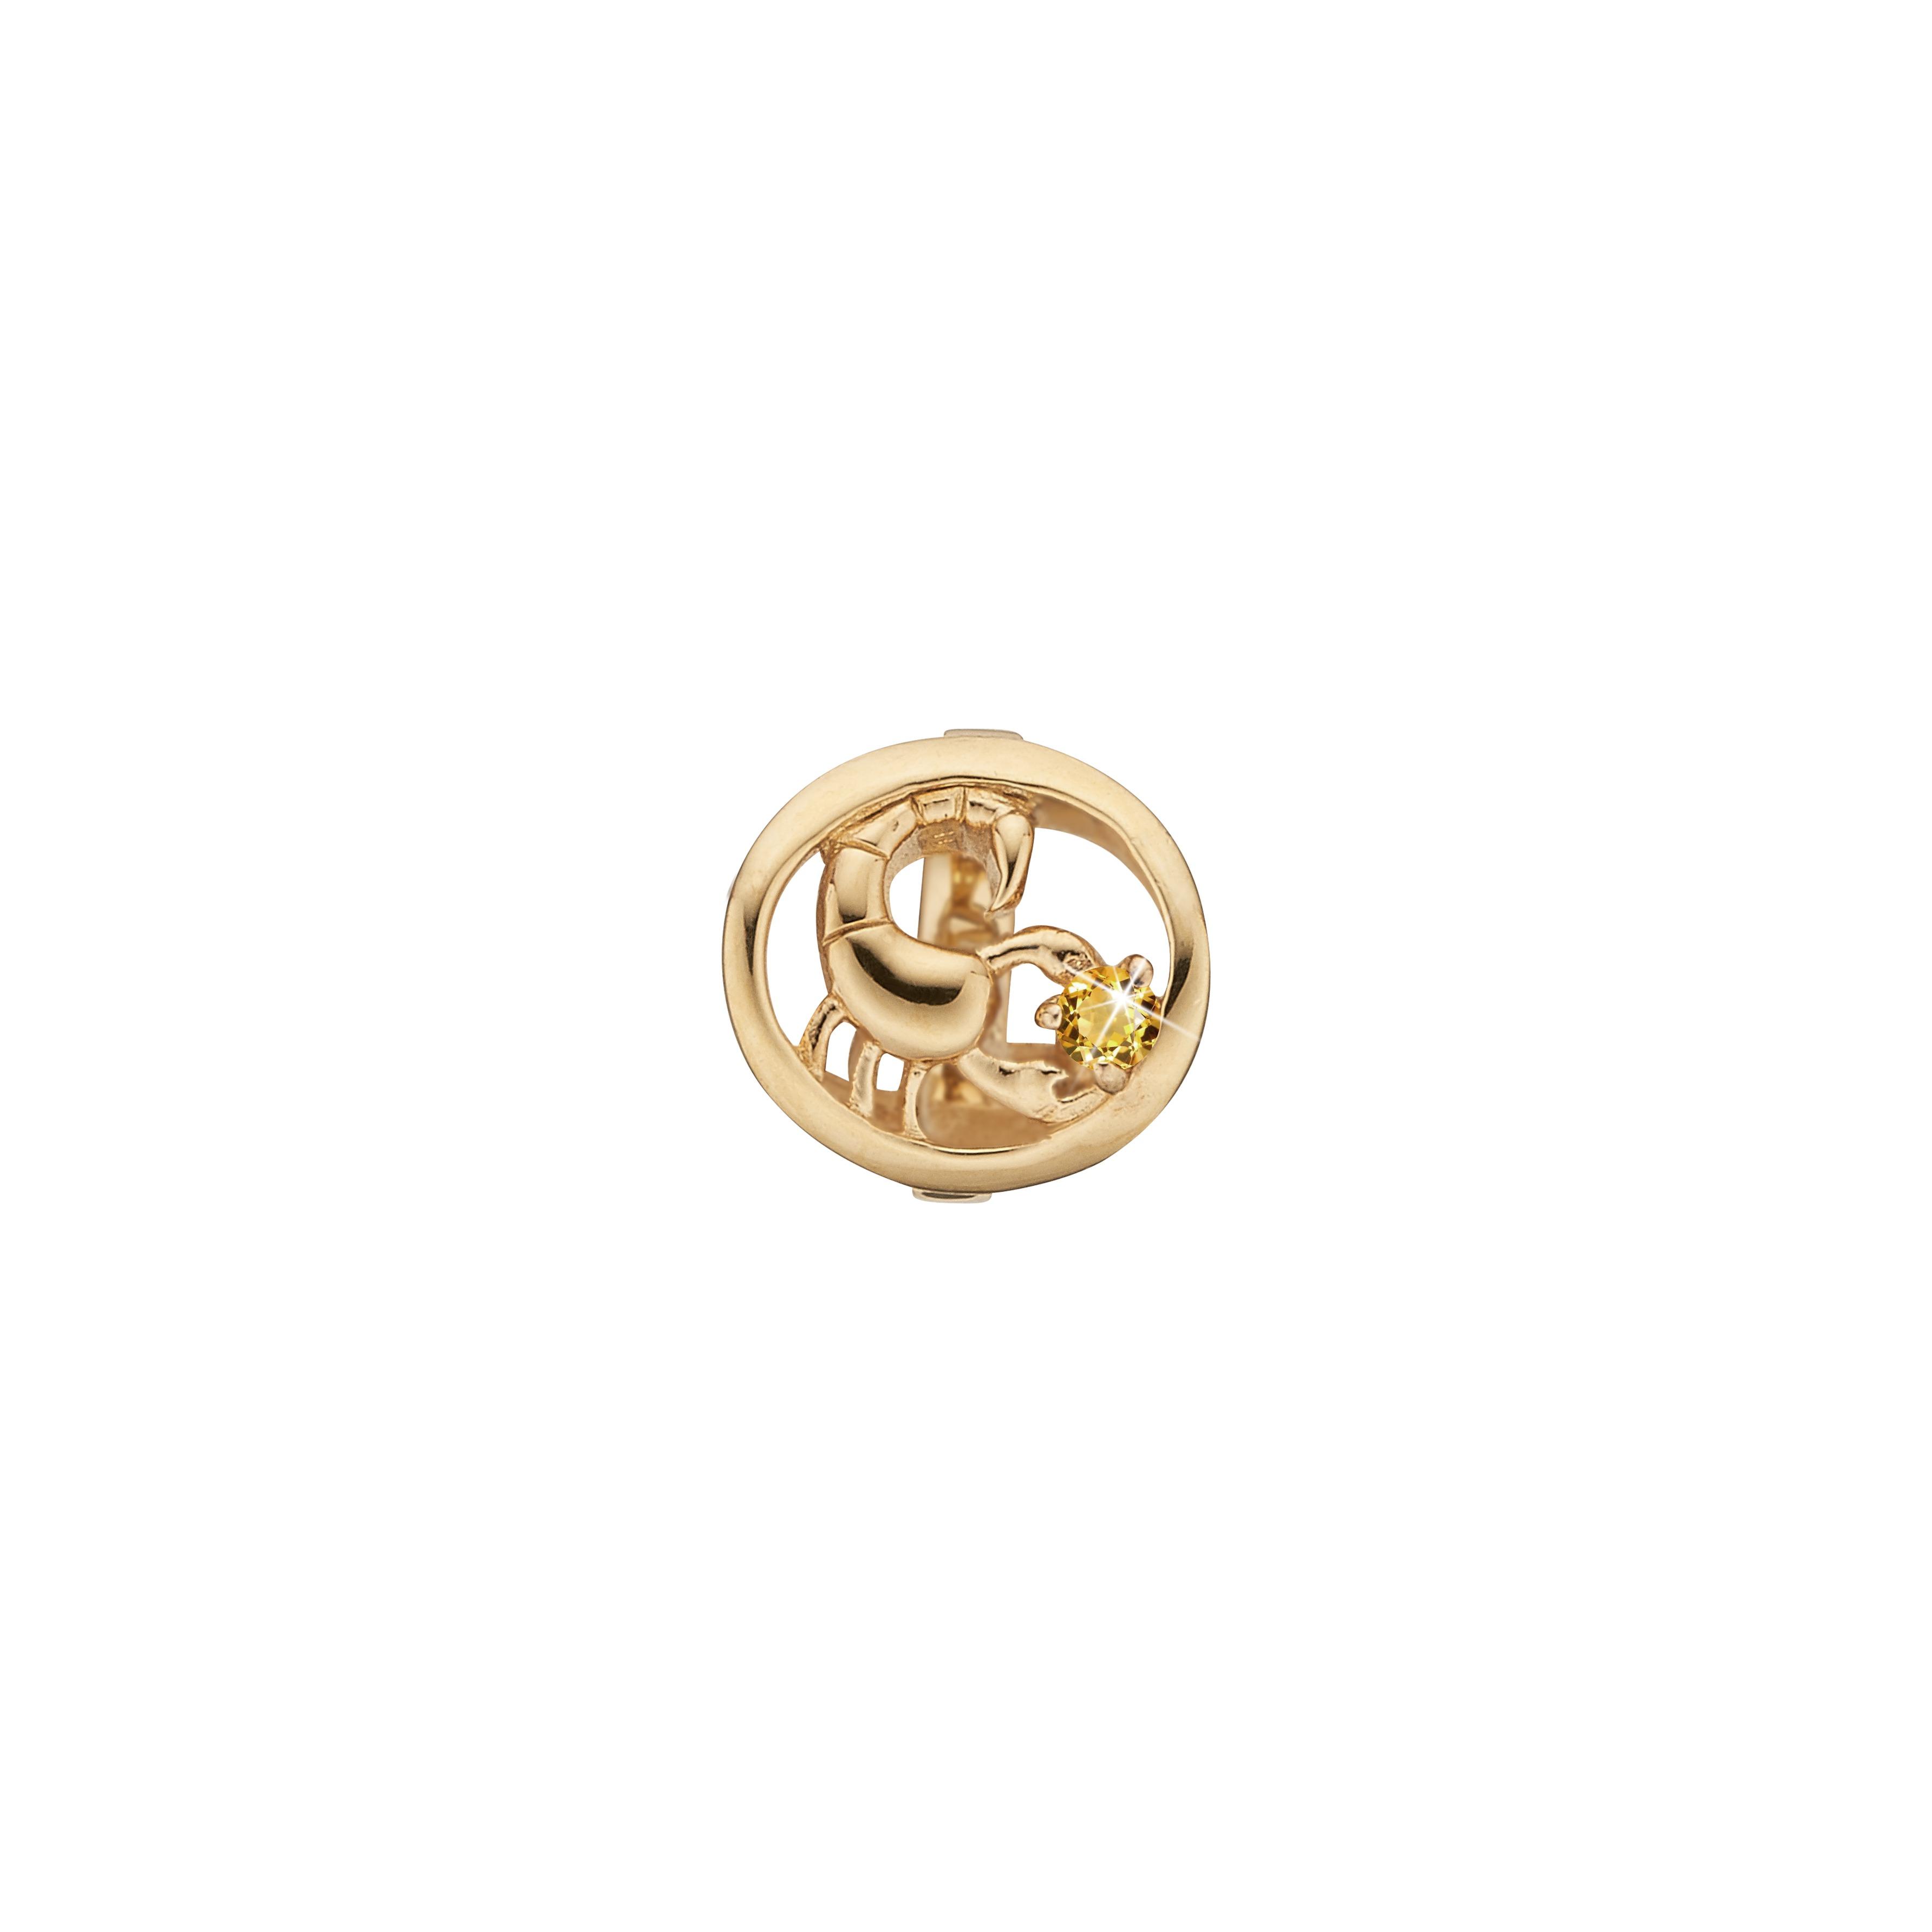 CHRISTINA Charm skorpion - 630-G67-10